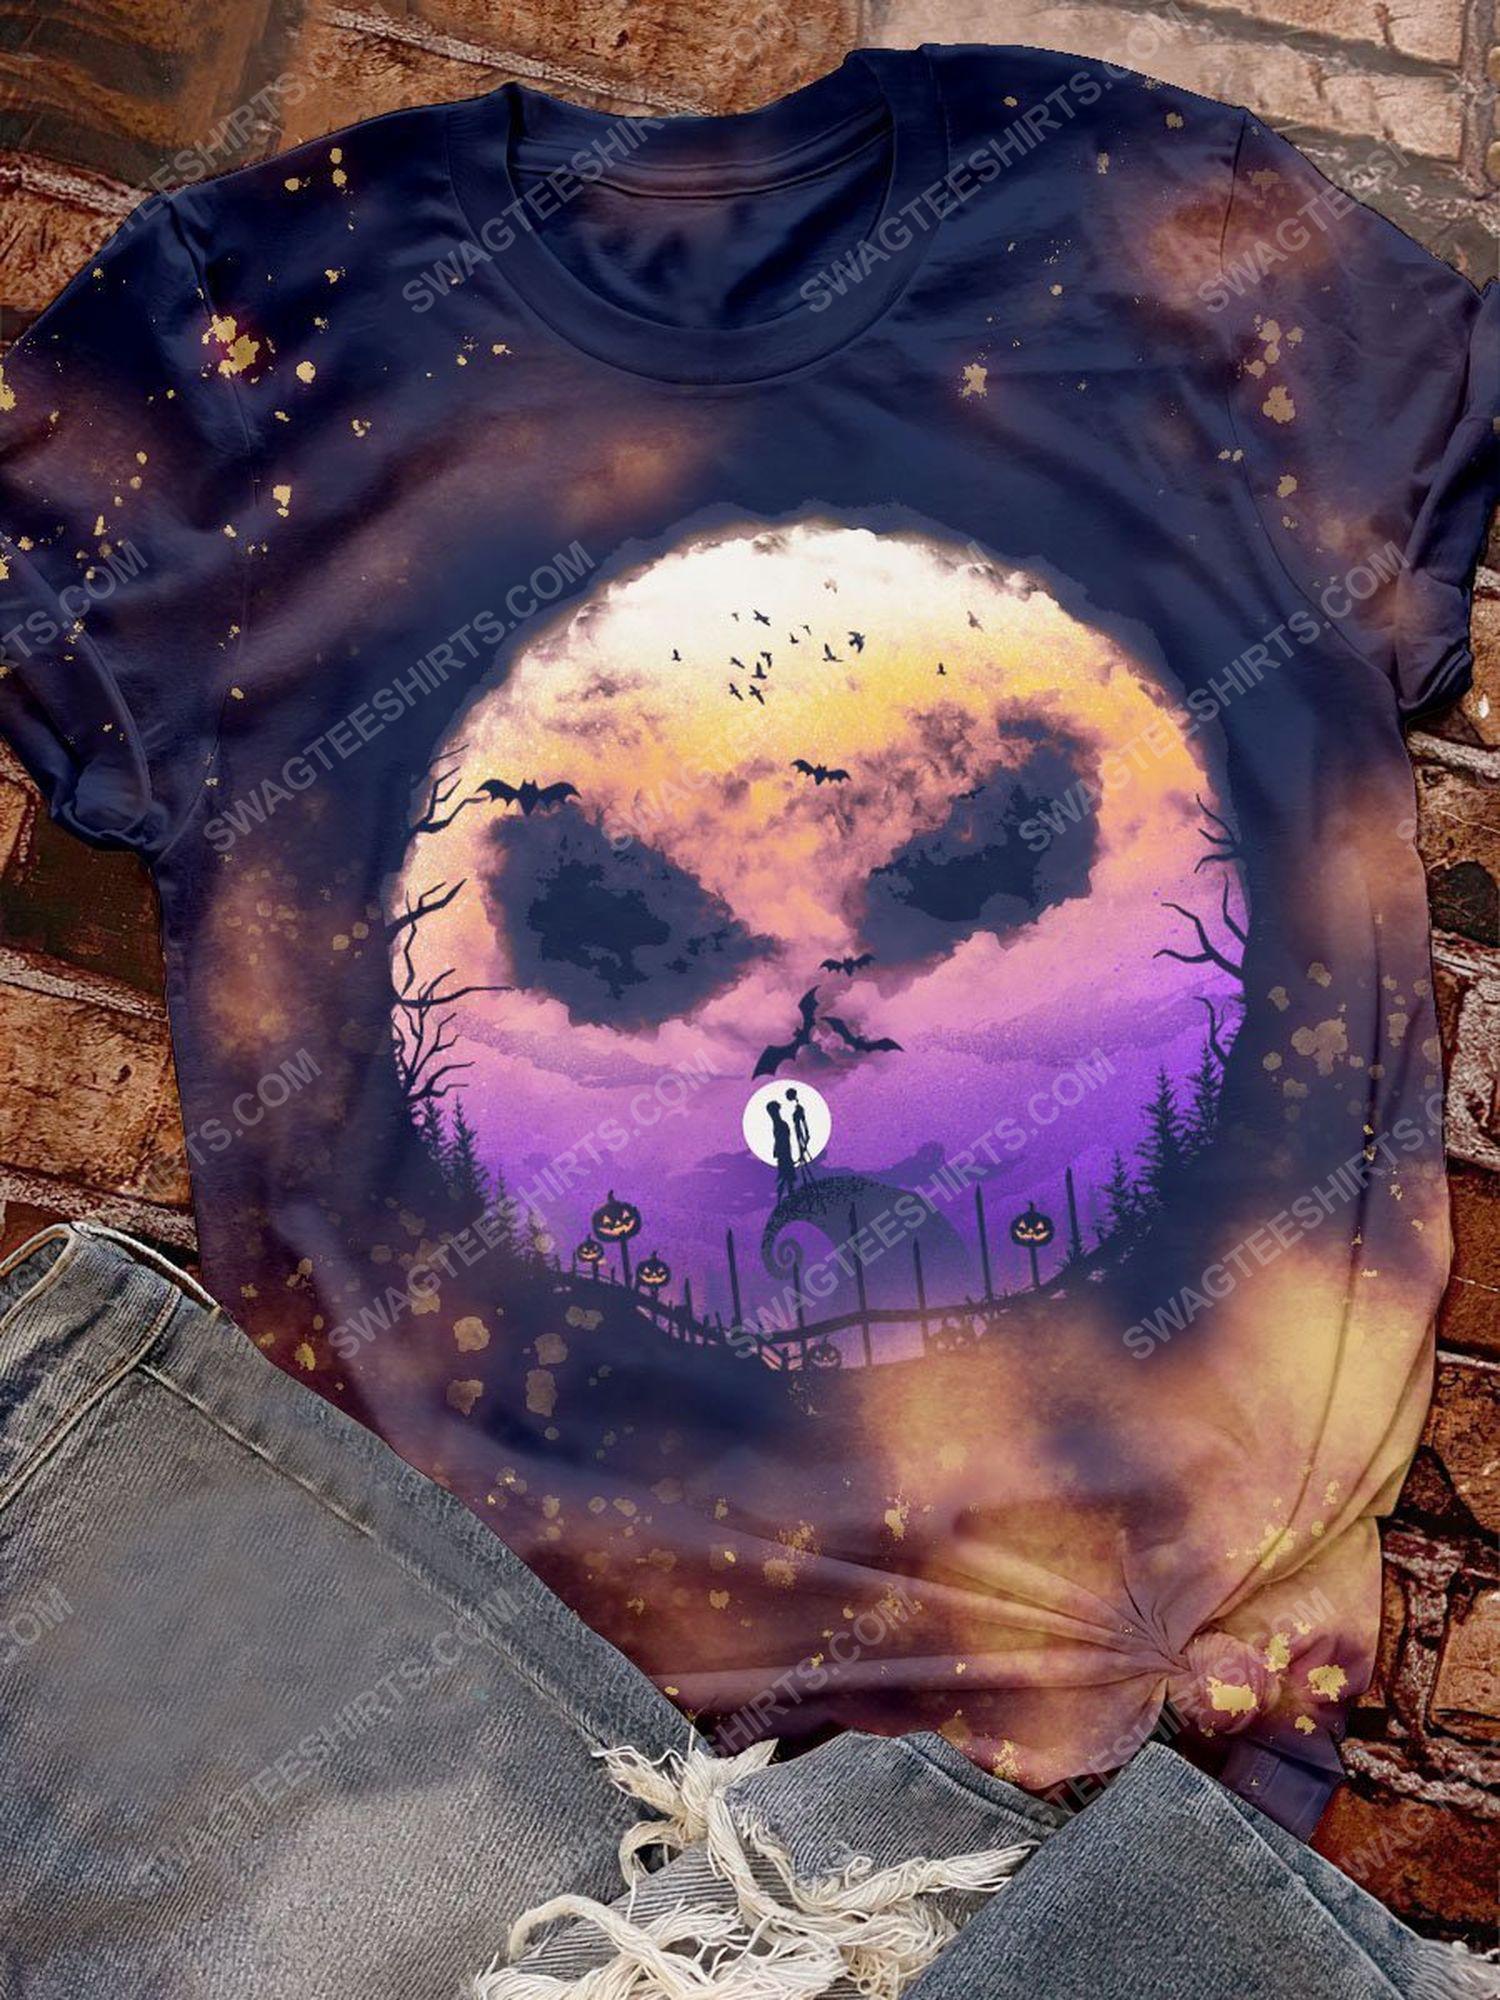 Halloween jack skellington and the nightmare before christmas shirt 1 - Copy (3)